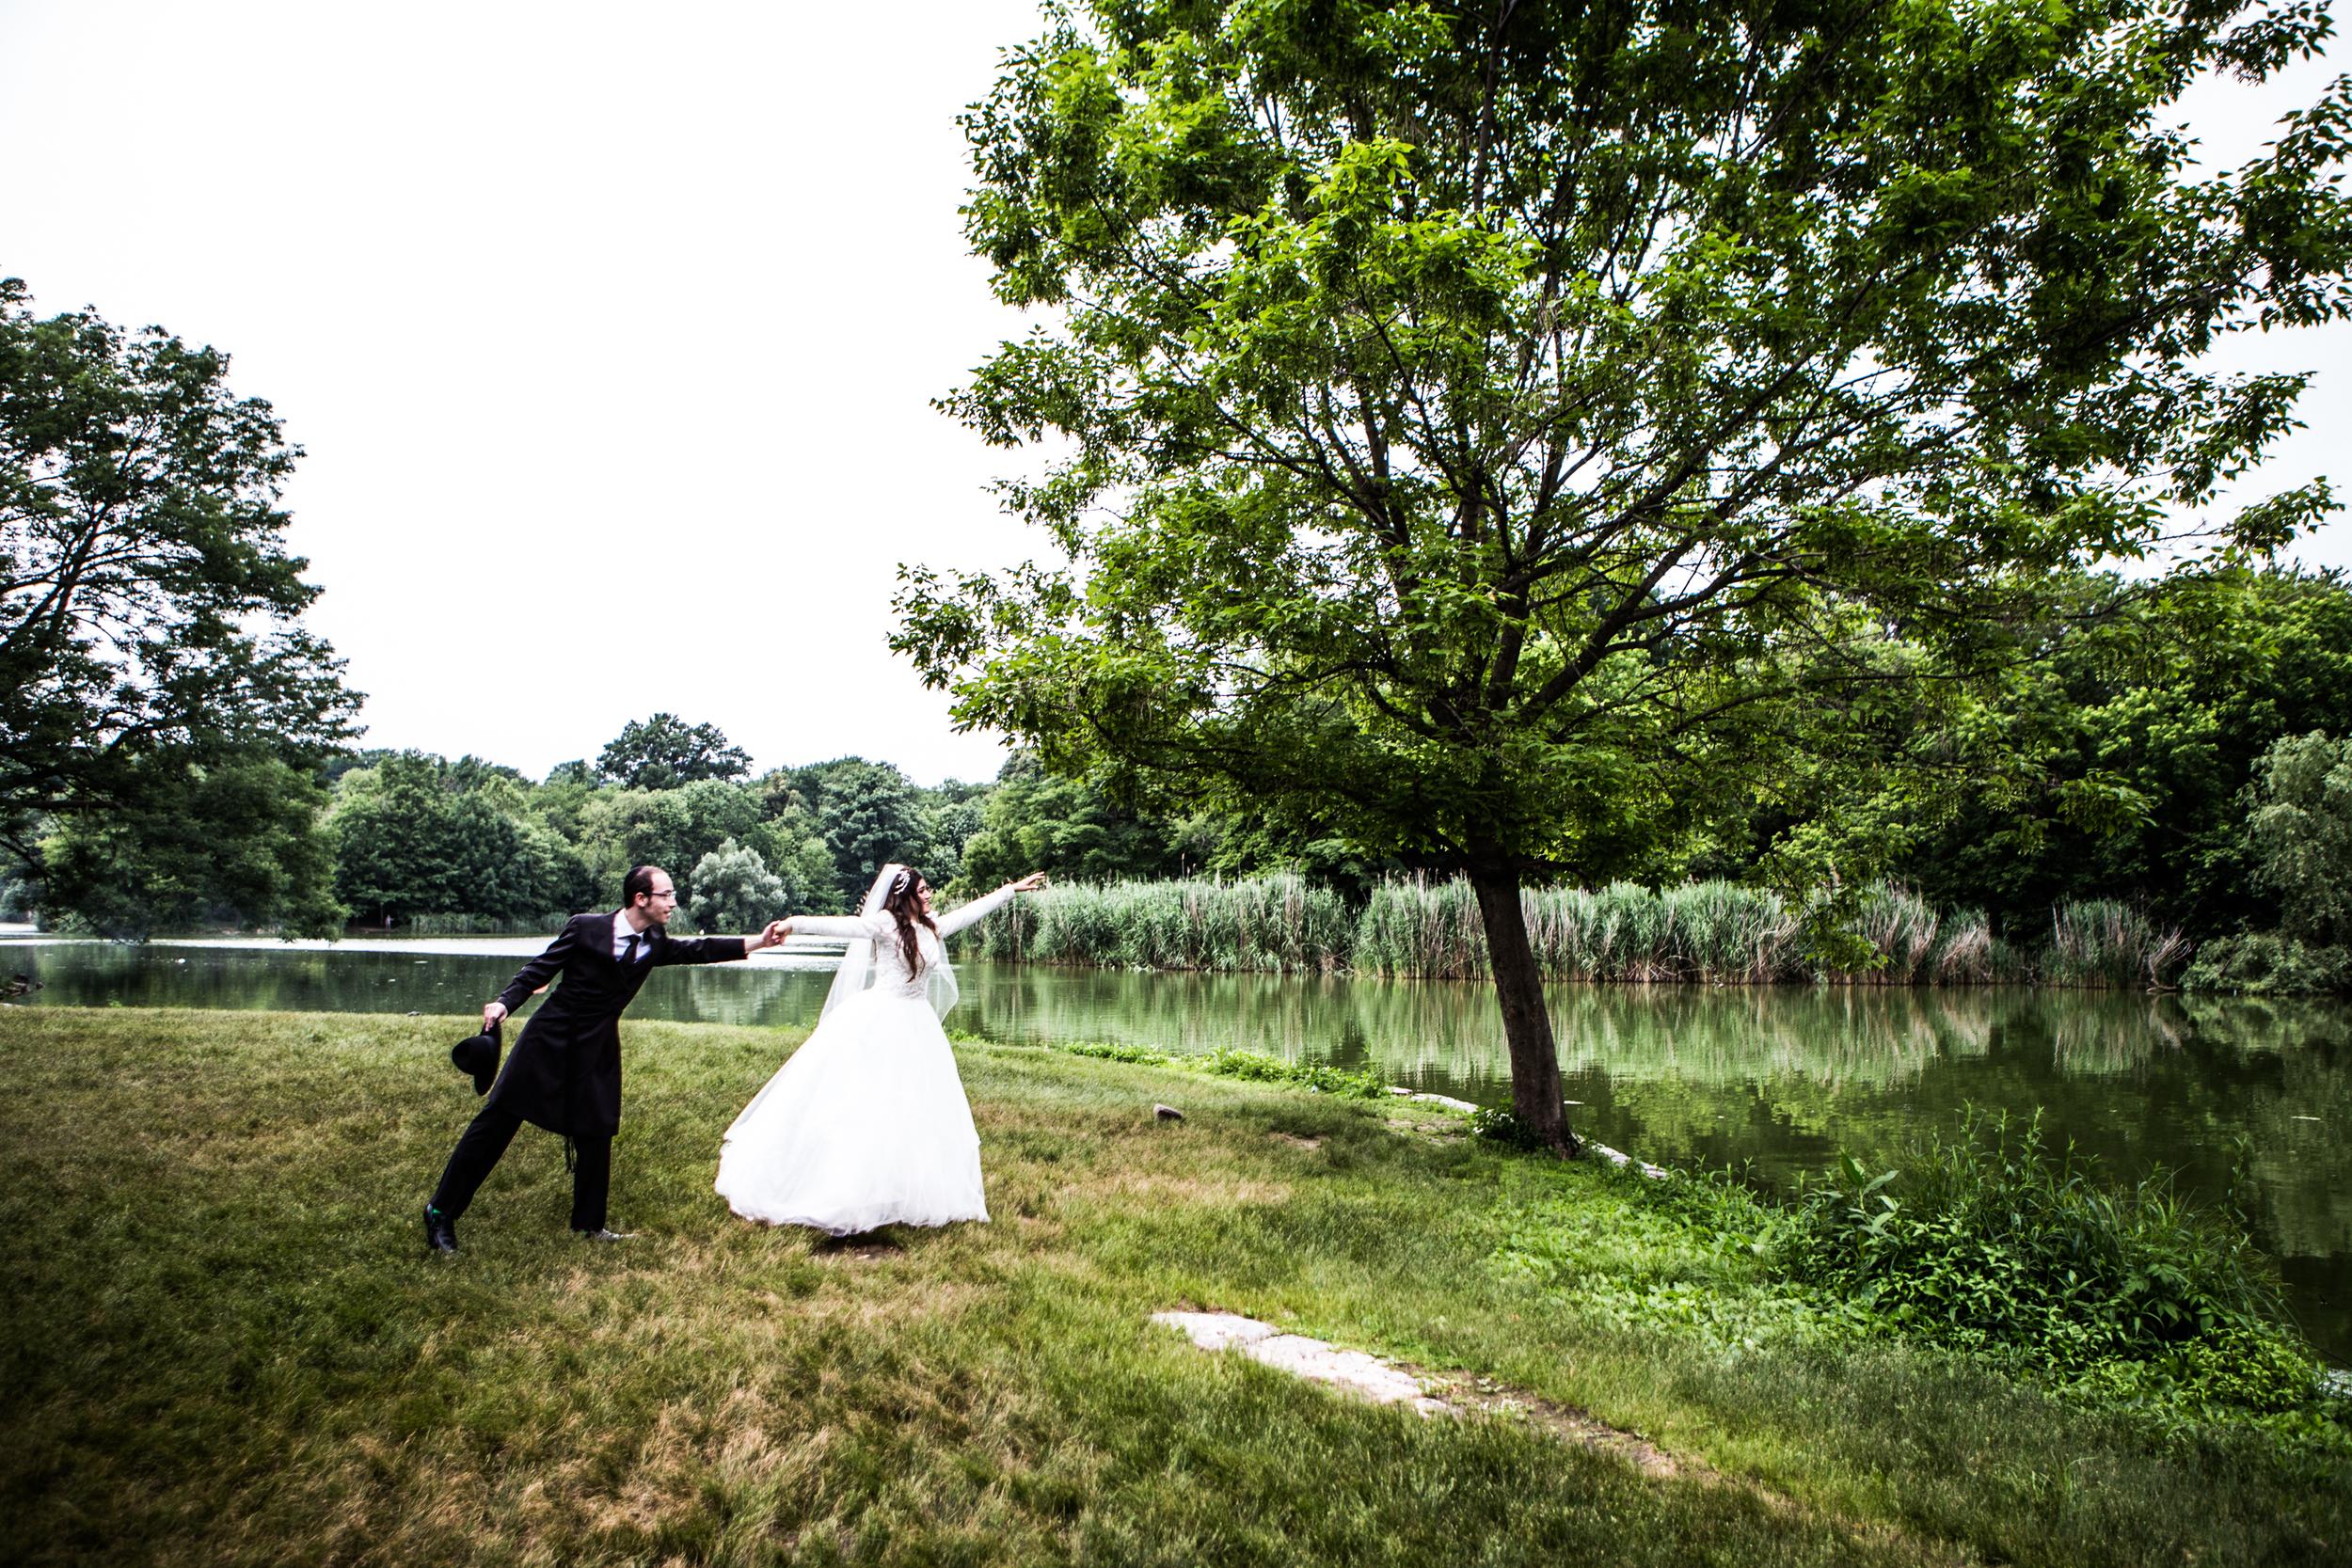 Wedding Iossi and Gitty Khafif  - Eliau Piha studio photography, new york, events, people 770 brooklyn -0618.jpg